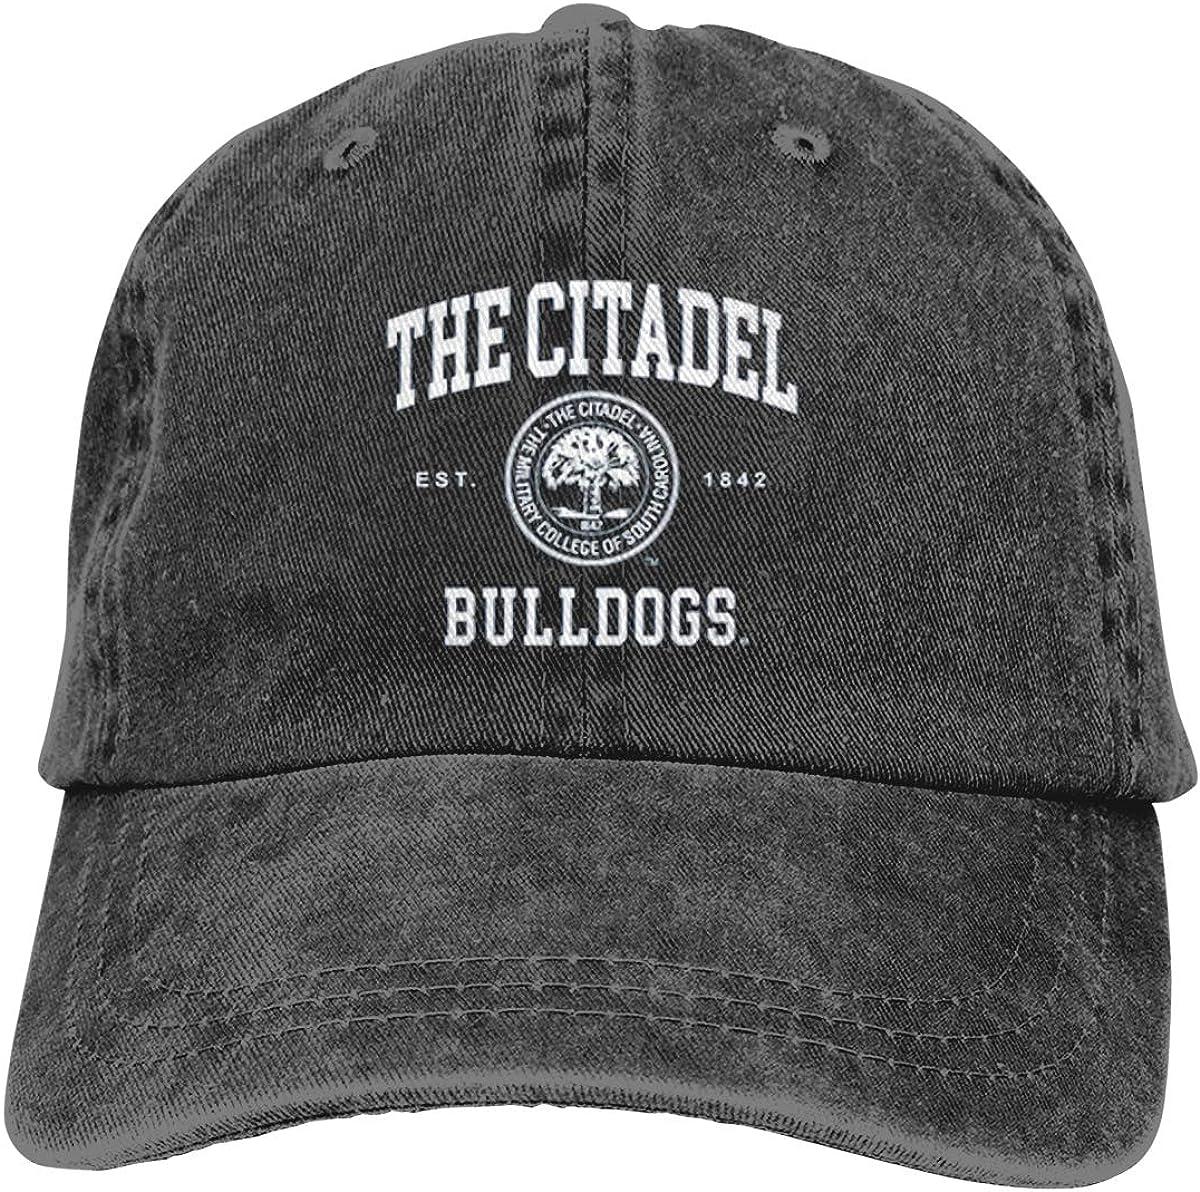 FELA The Citadel Bulldogs Seal Adjustable Unisex Hat Baseball Caps Black